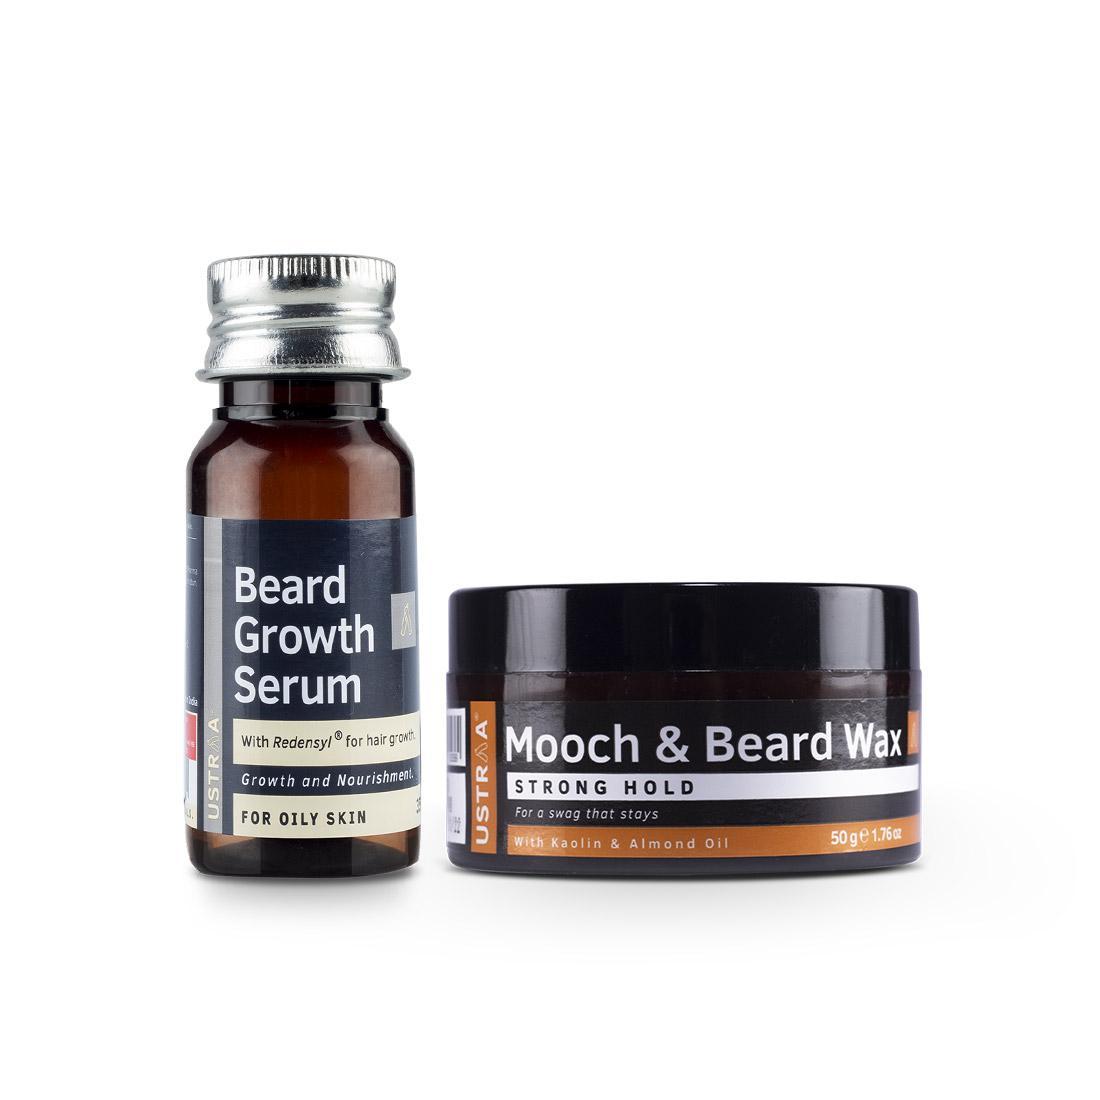 Beard Growth Serum and Beard and Mooch Styling Wax